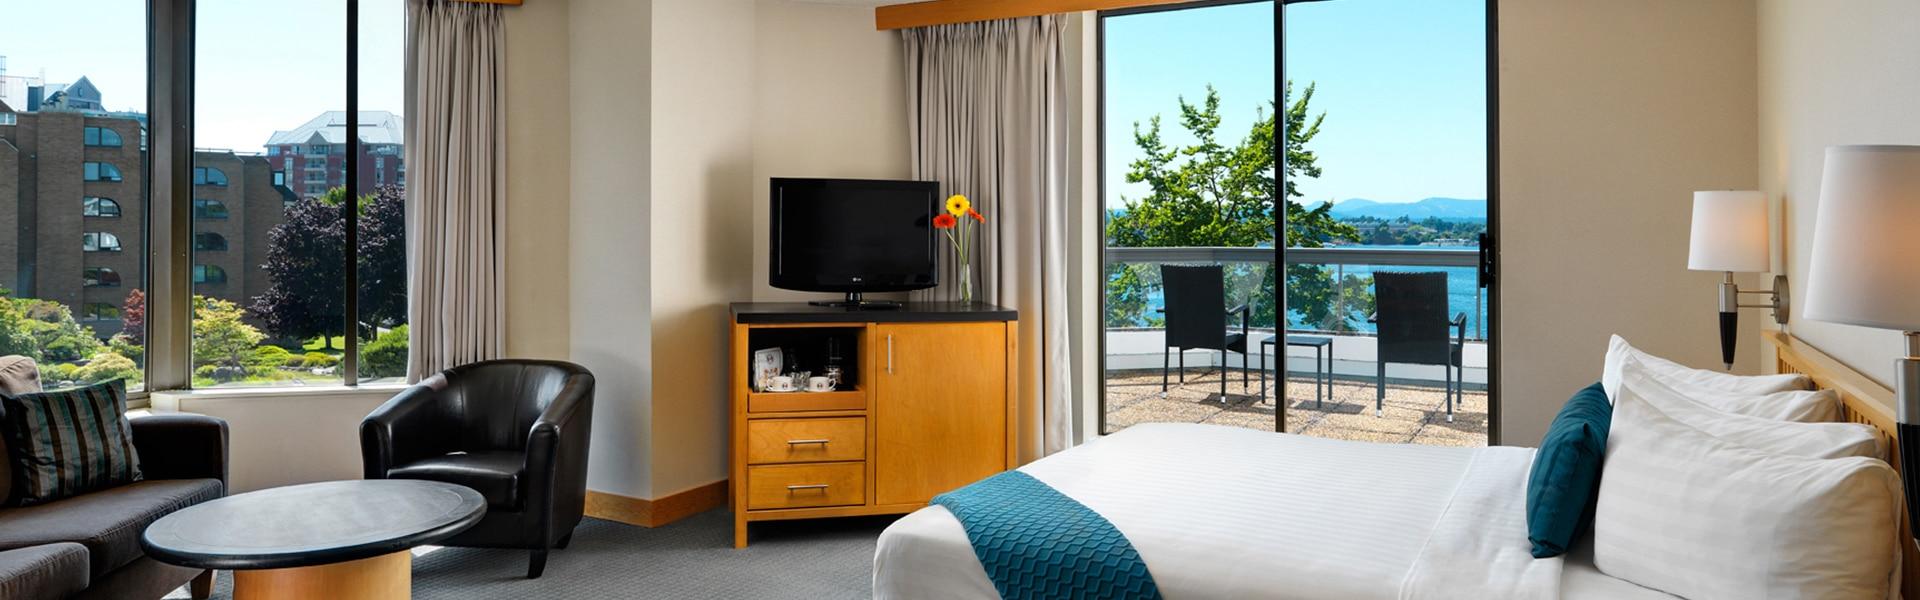 Sunset Room Inn at Laurel Point Victoria